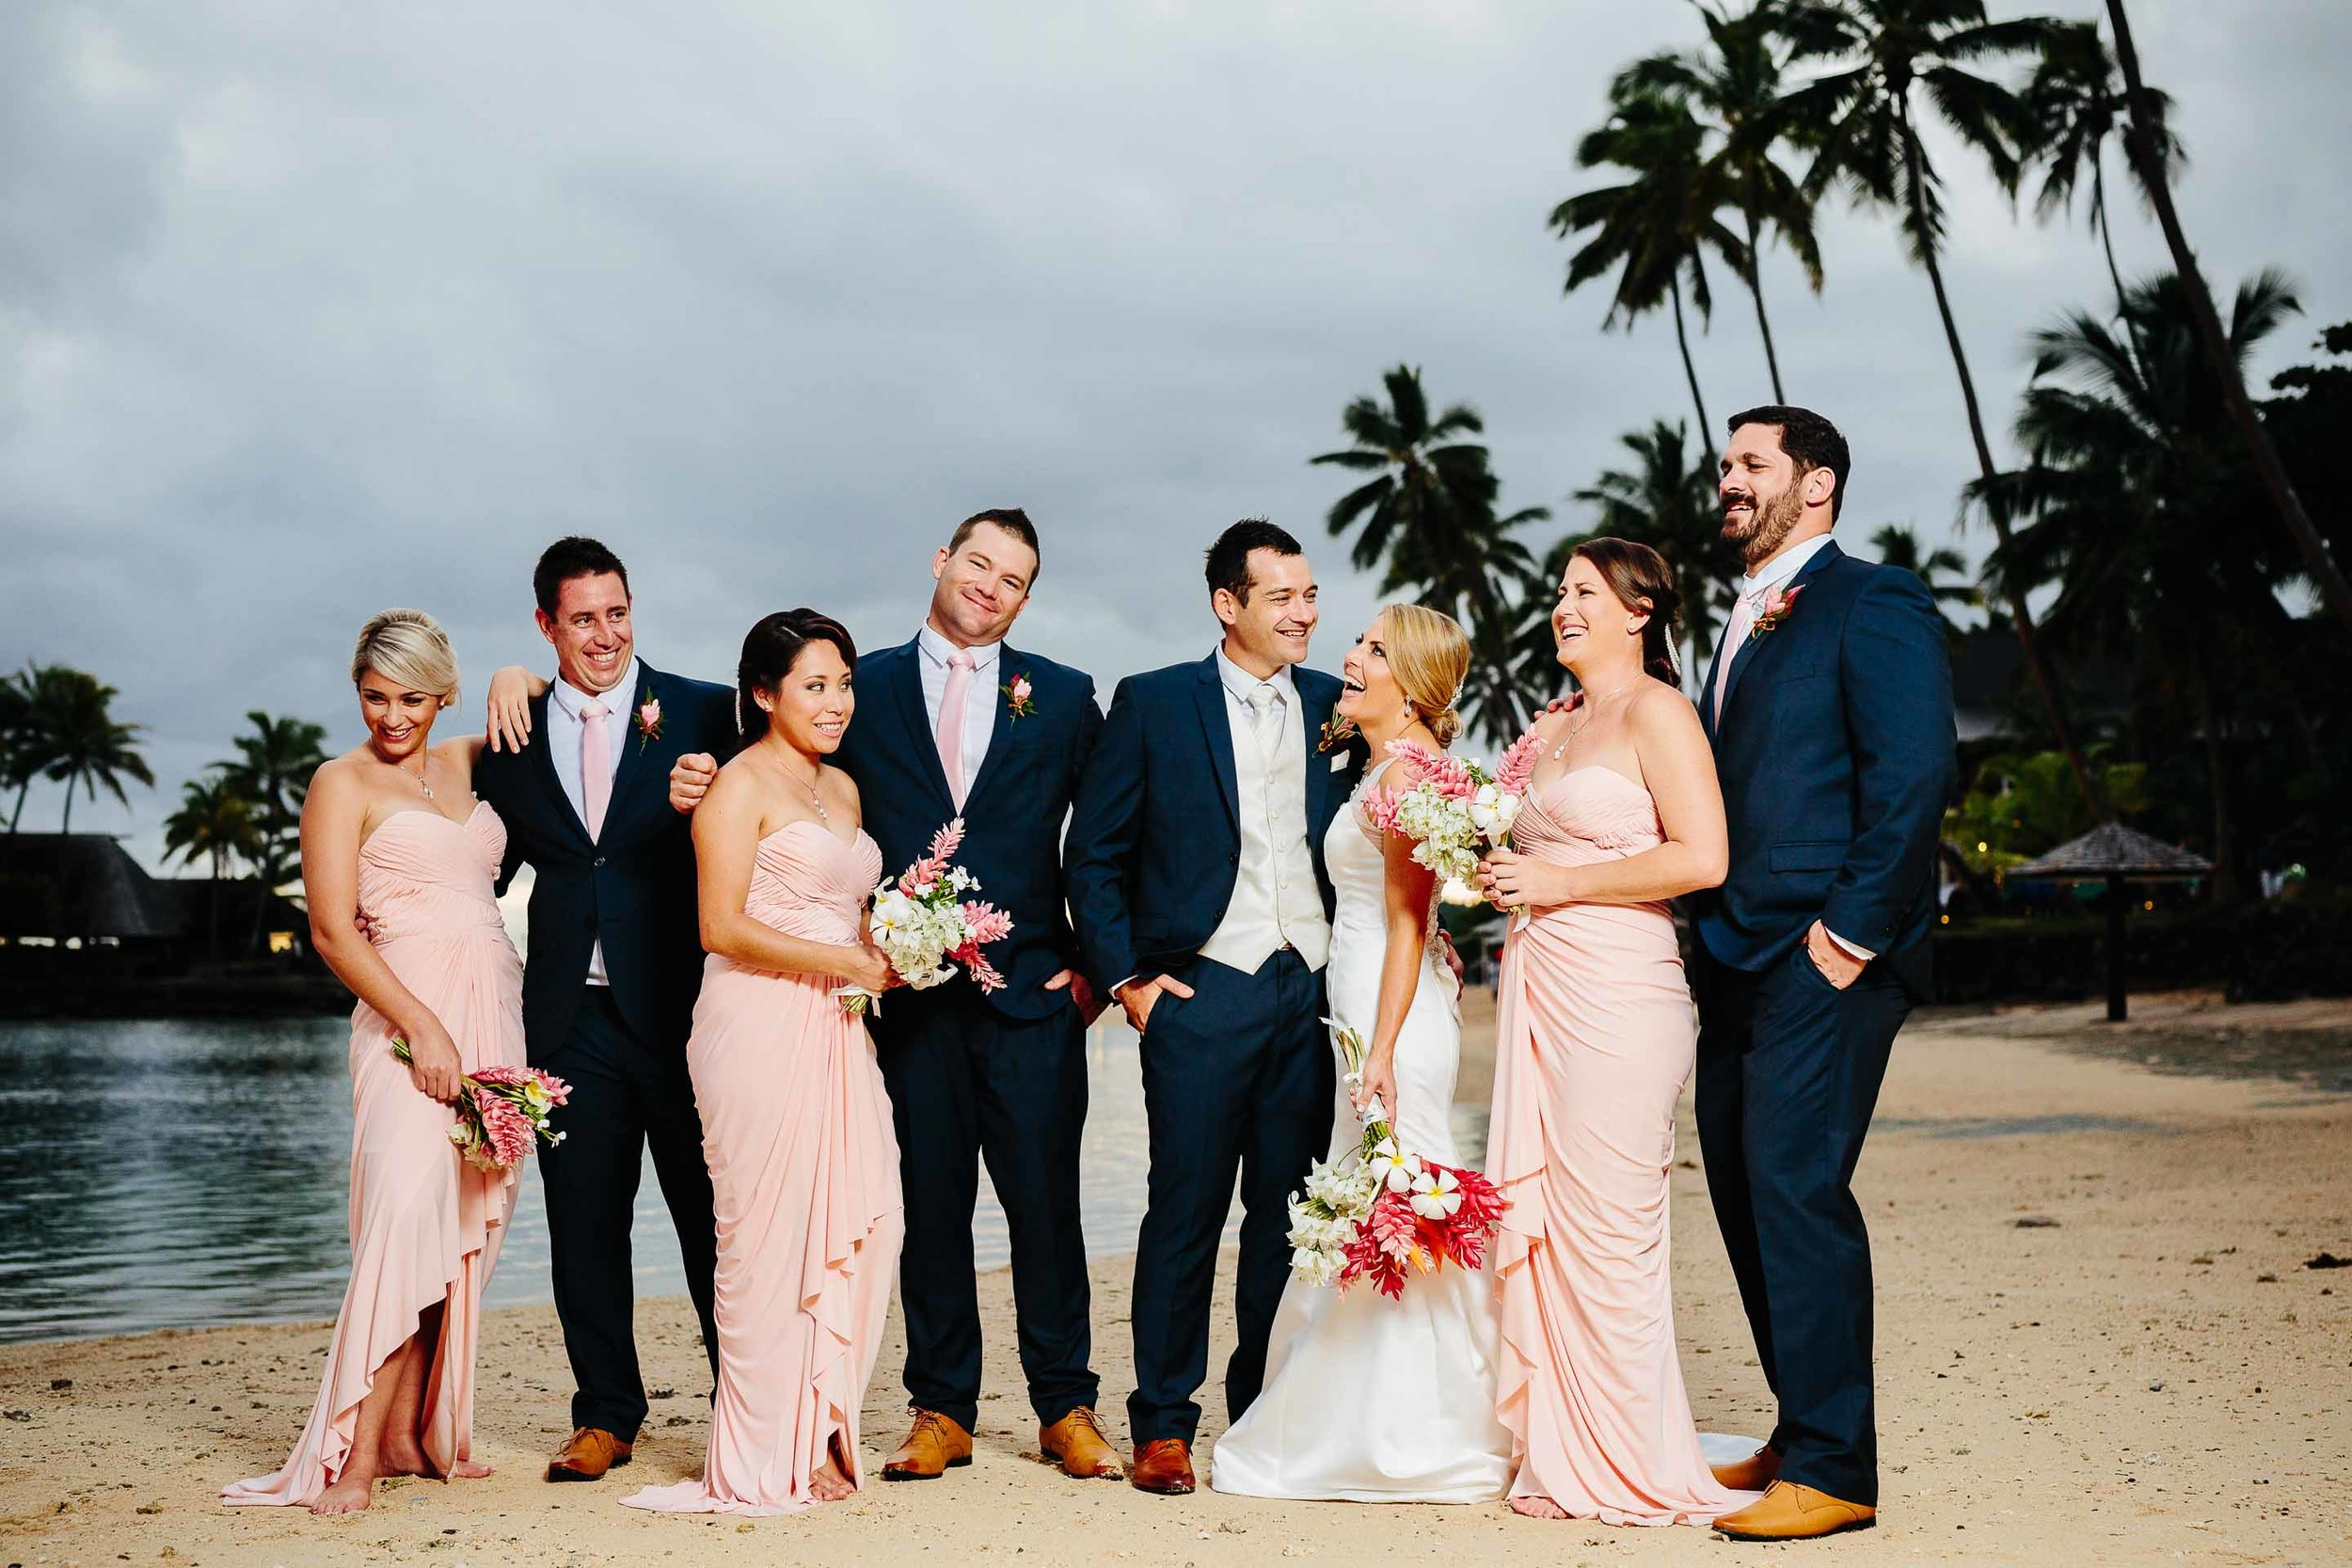 bridal party having fun on the beach